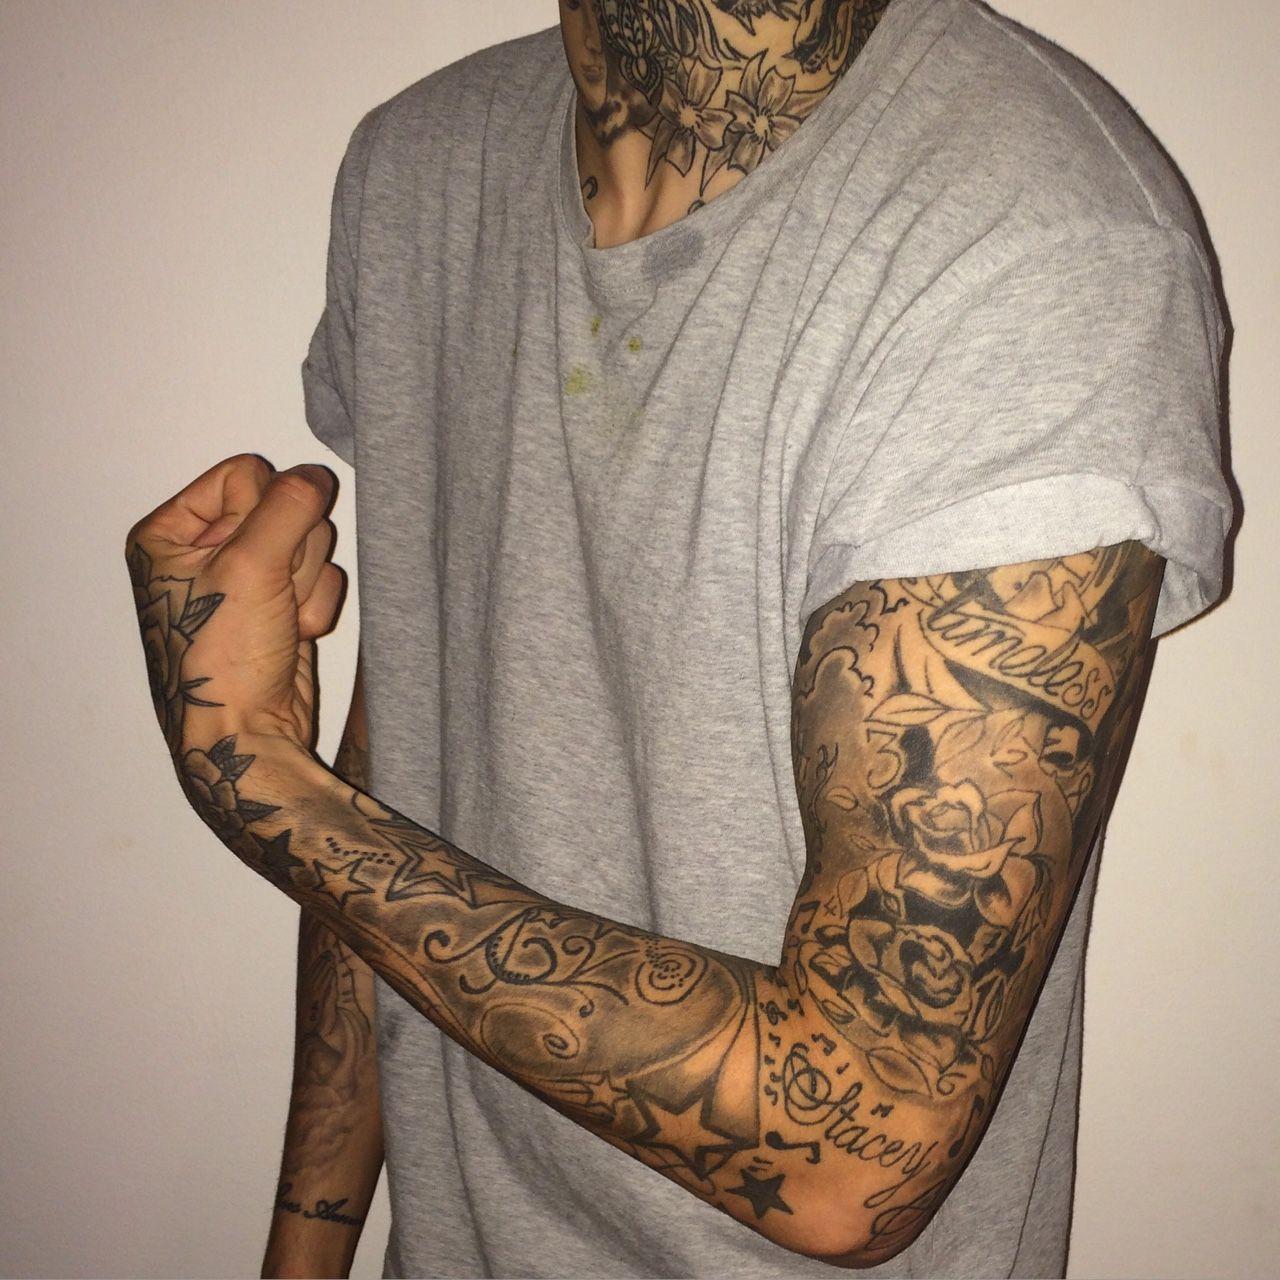 WALKING CONTRADICTION Sleeve tattoos, Tattoos, Full arm